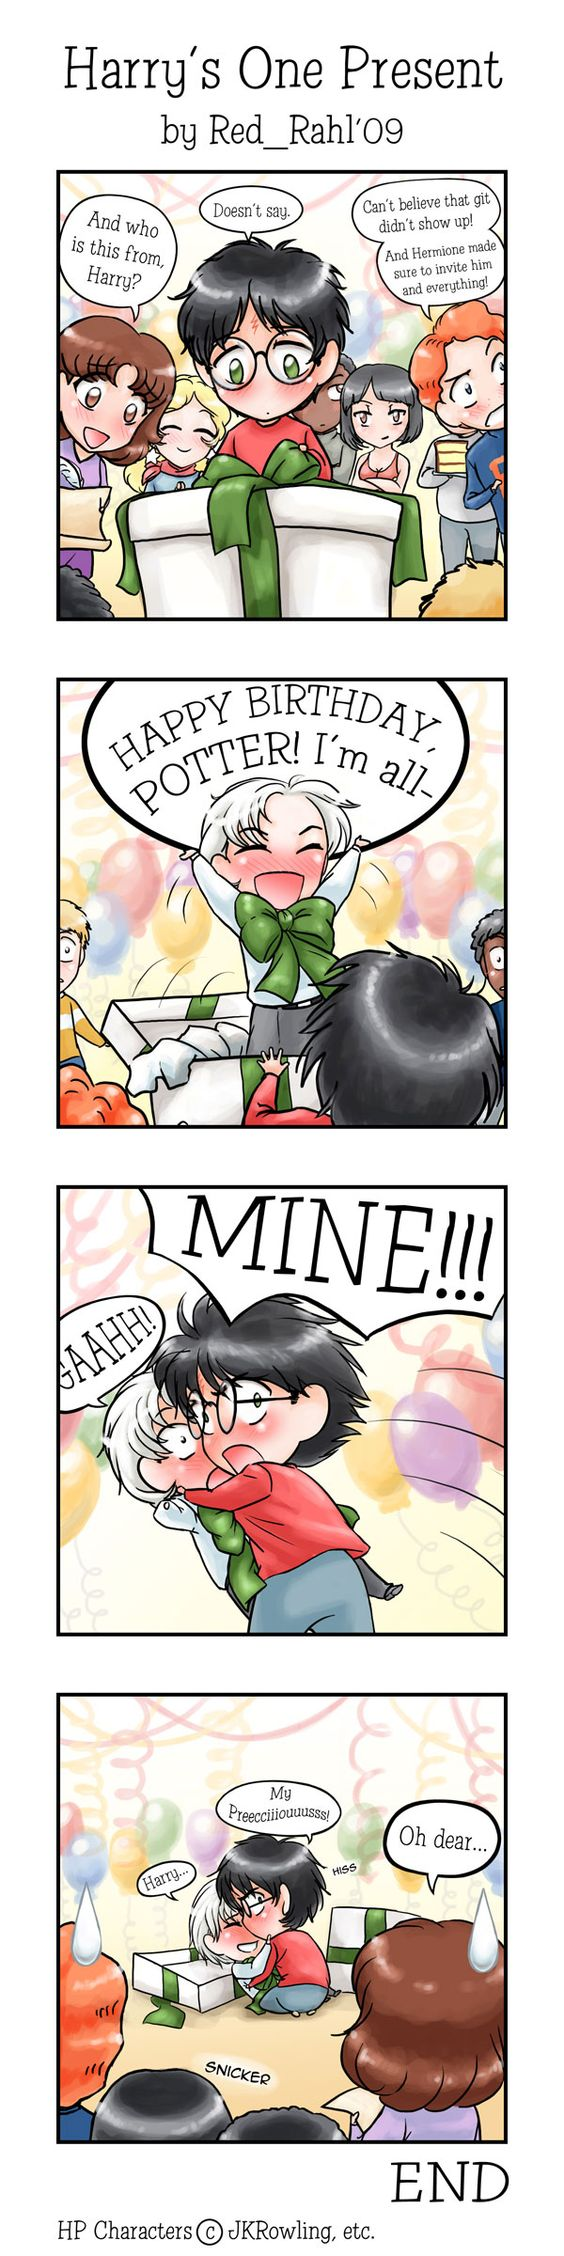 Chibi HD Comic: Harry's One Present (G) - Art on a Rampage!